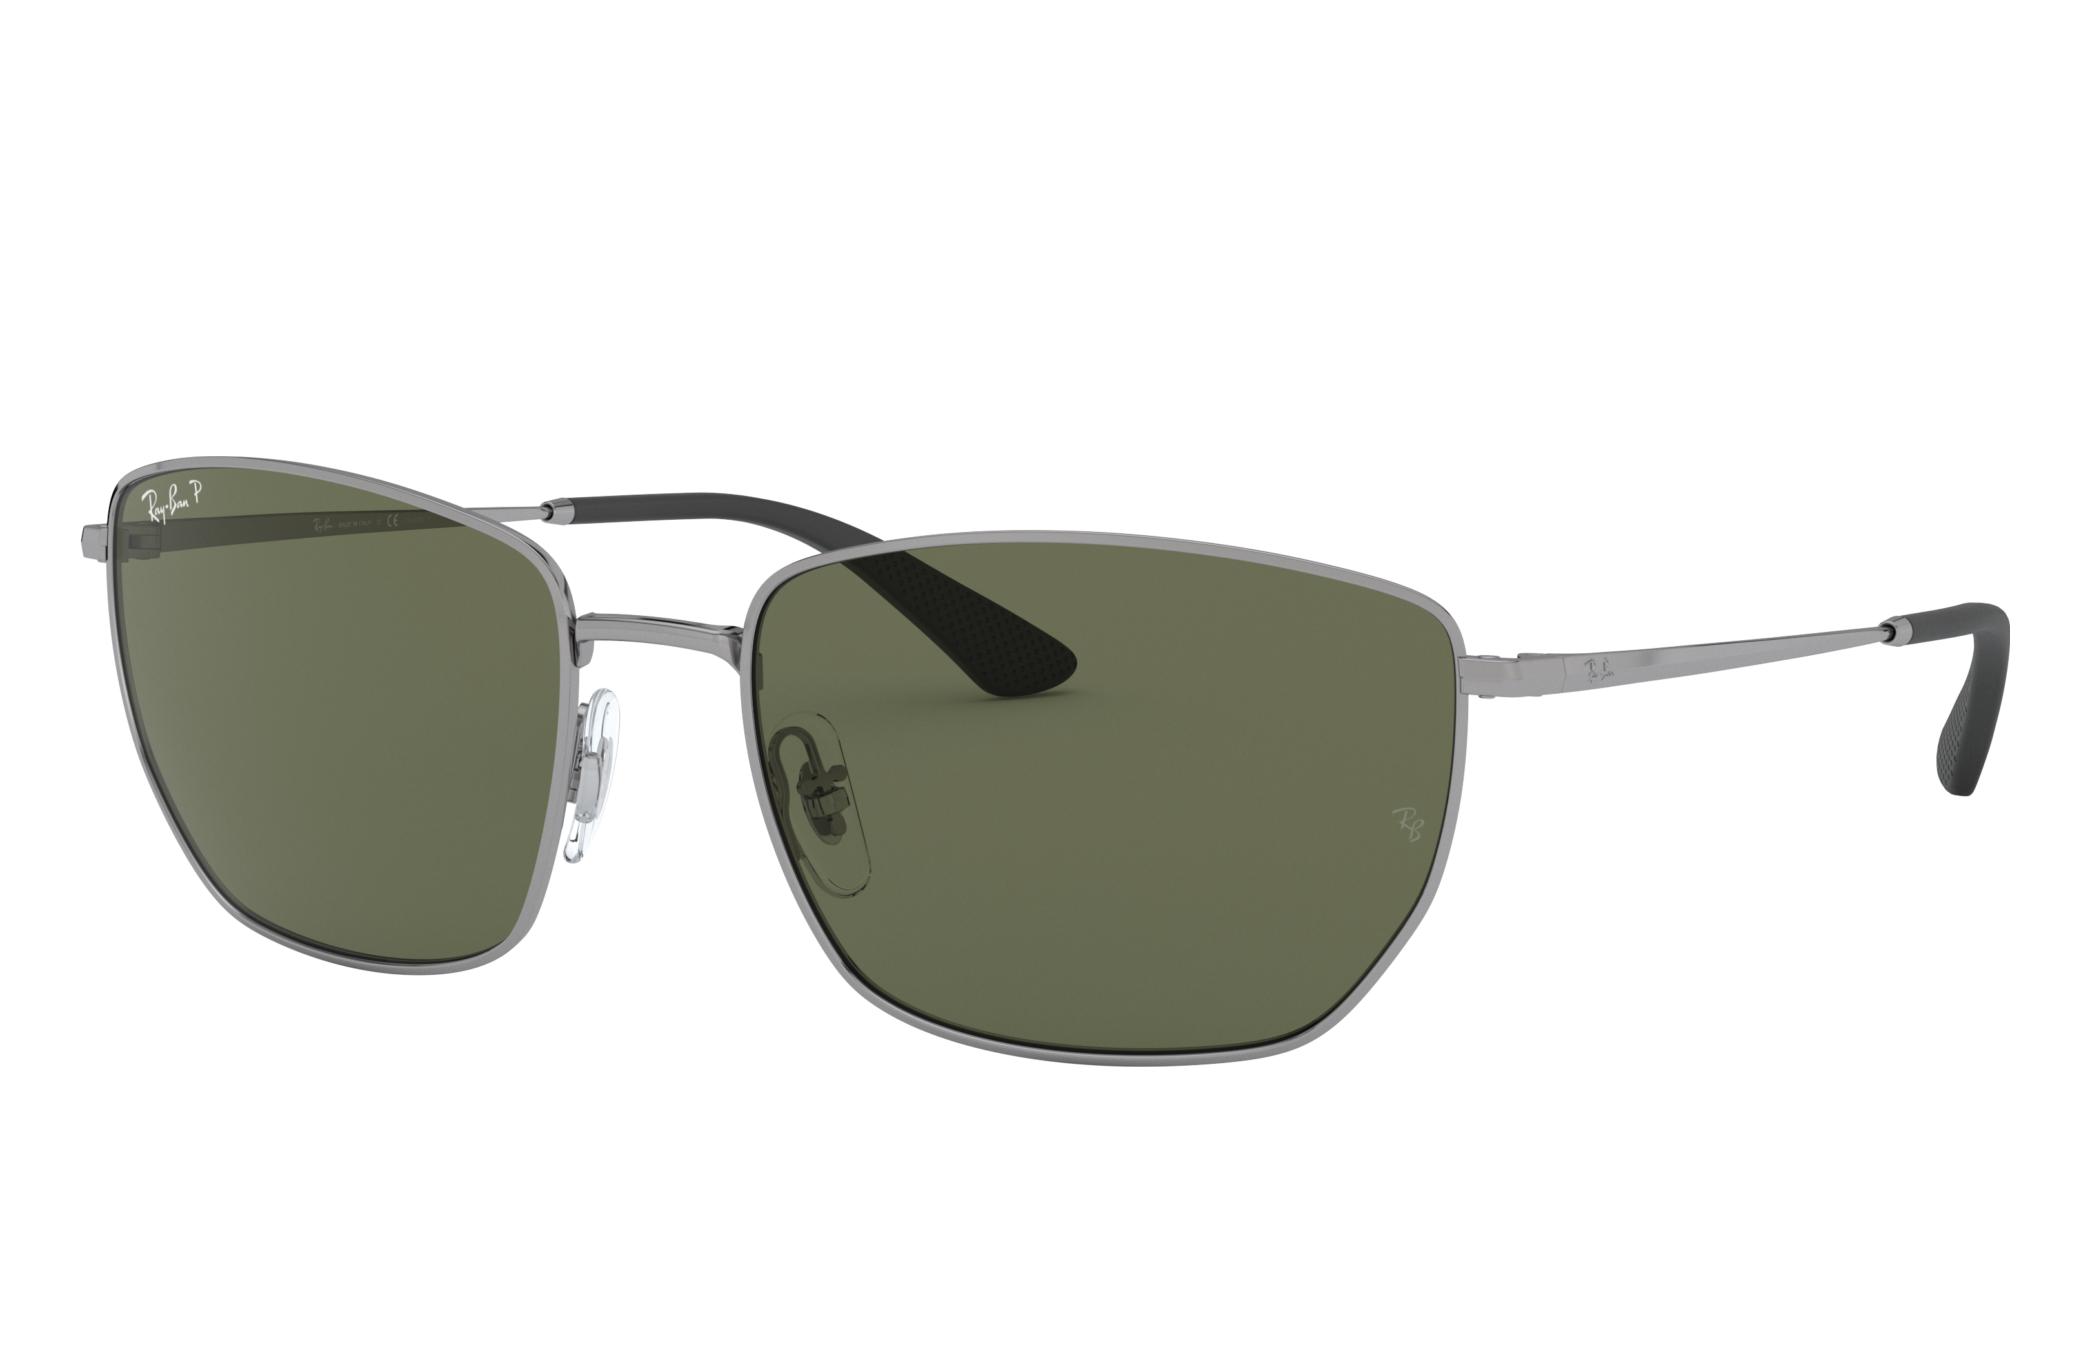 Ray-Ban Rb3653 Gunmetal, Polarized Green Lenses - RB3653